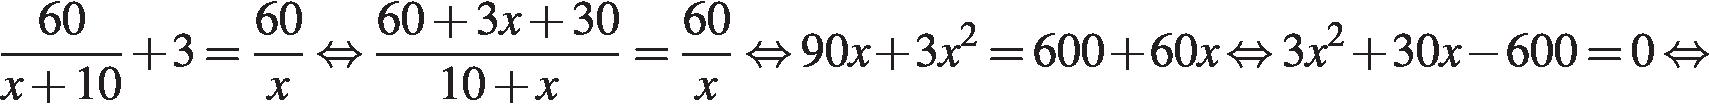 http://sdamgia.ru/formula/45/455e11a88db695ed02f58a576749502ep.png